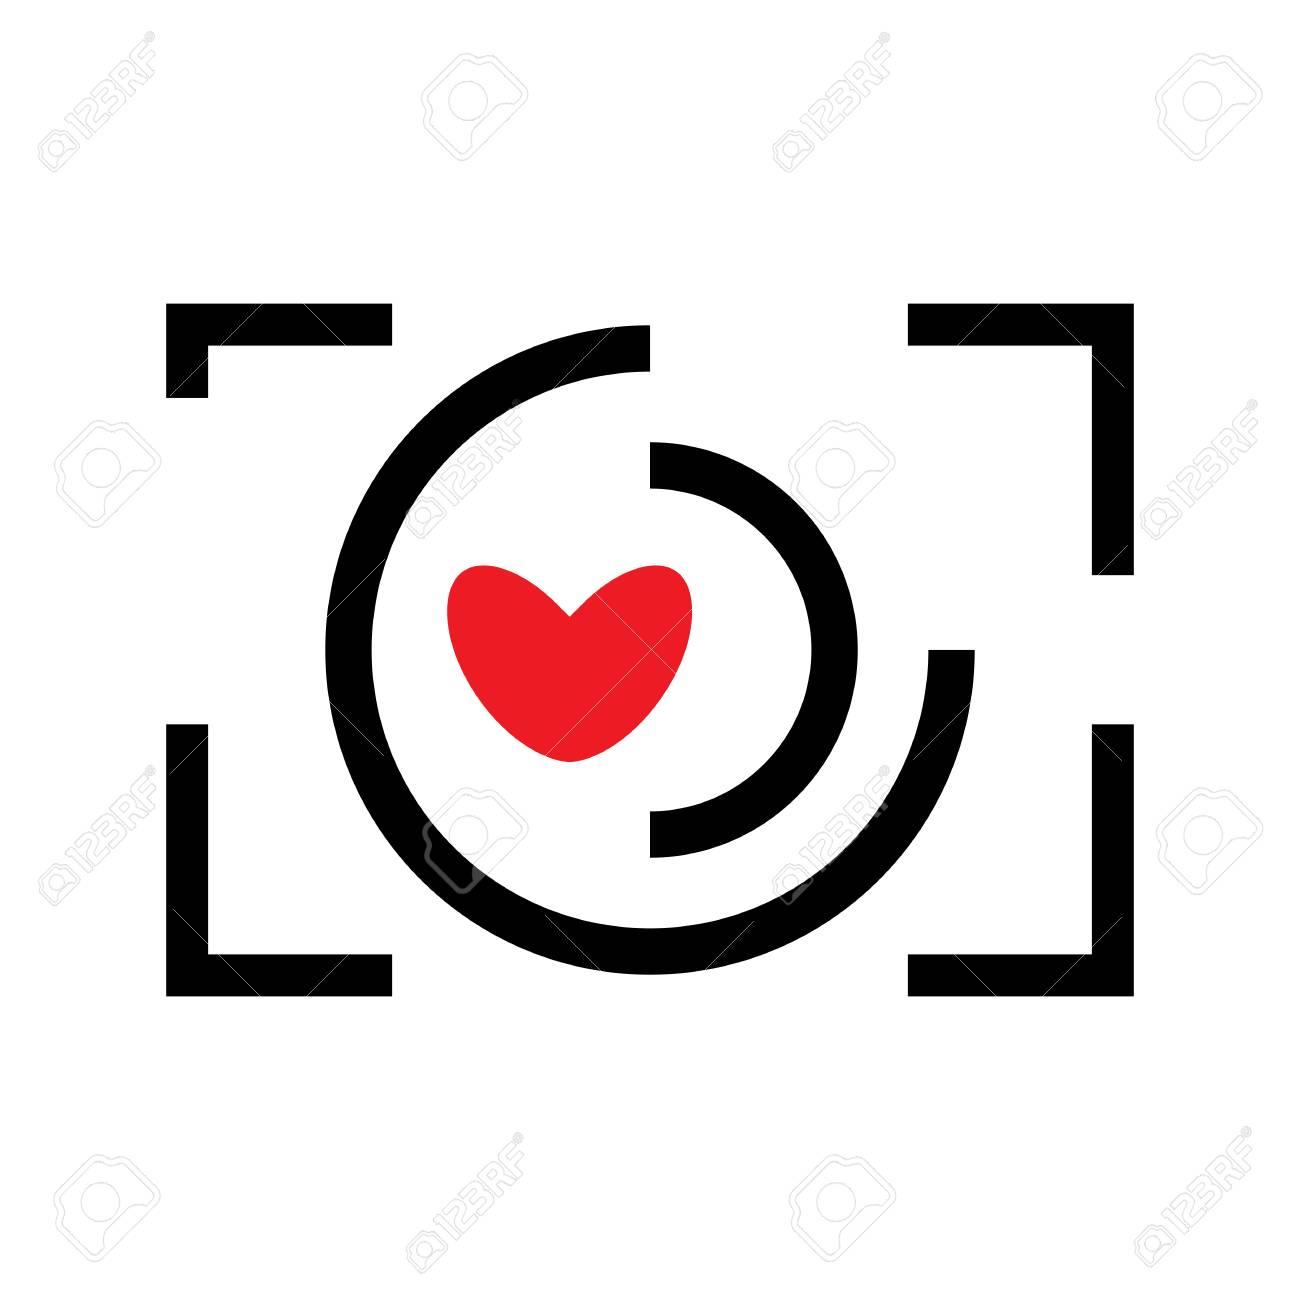 Digital Camera And Heart Vector Icon Snapshot Photography Sign